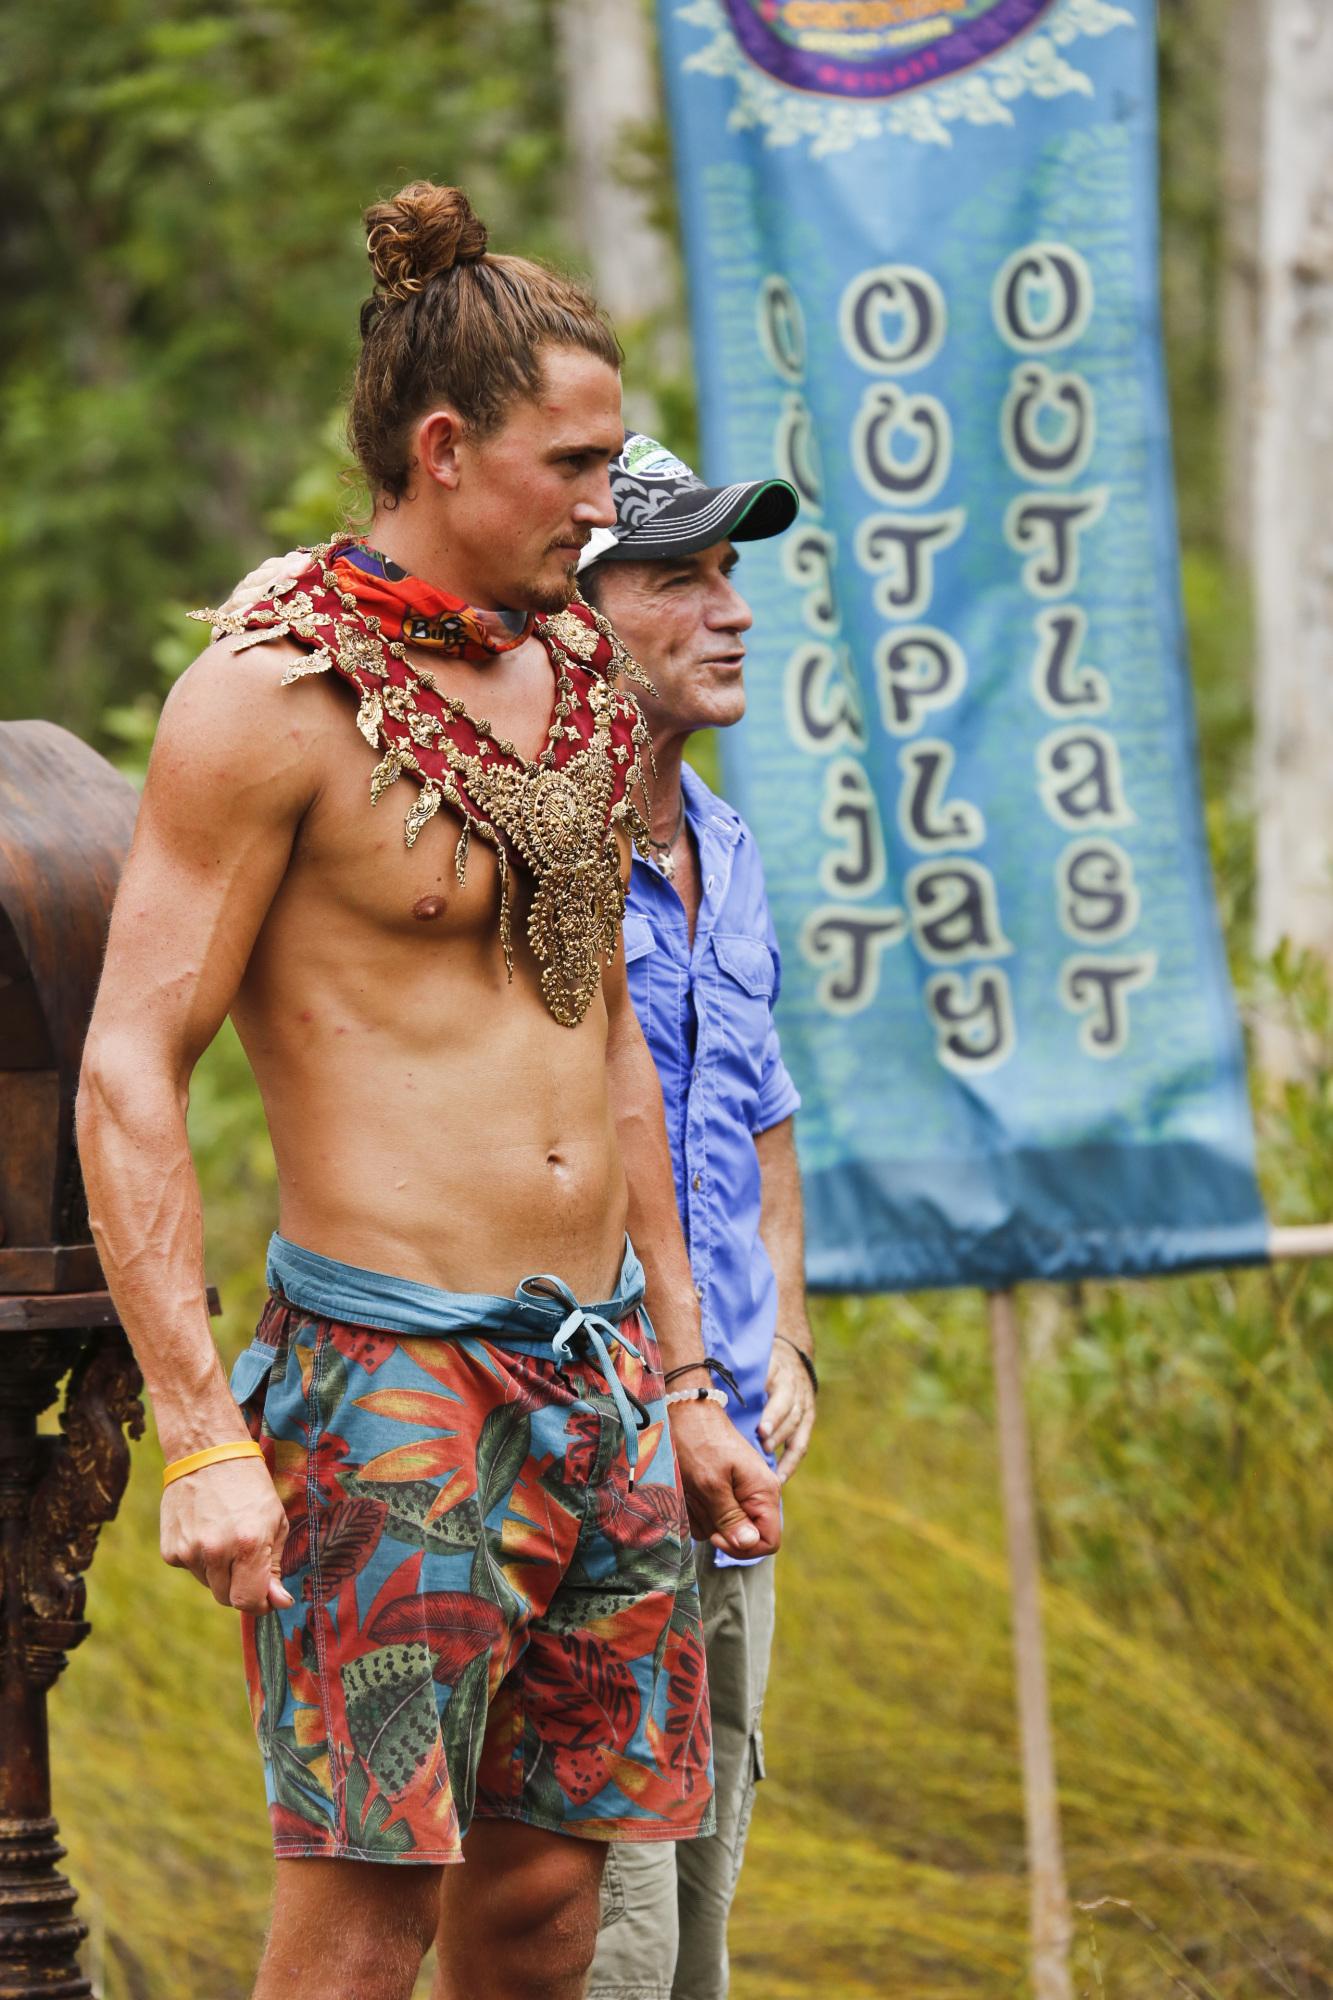 Joe Anglim wins Immunity on Survivor: Second Chance